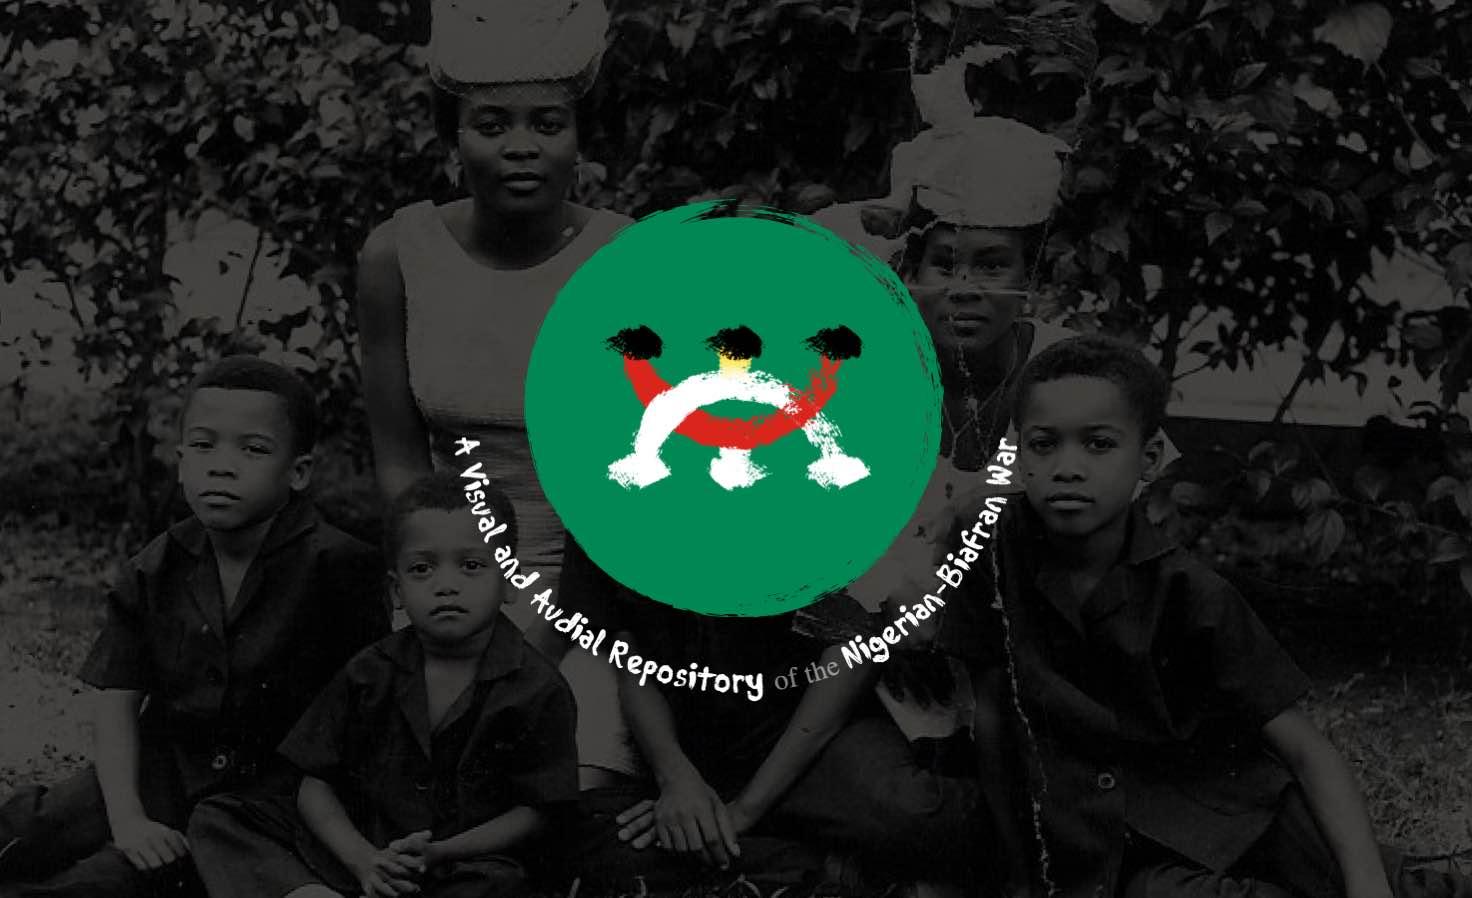 Nigerian-Biafran War Imagery